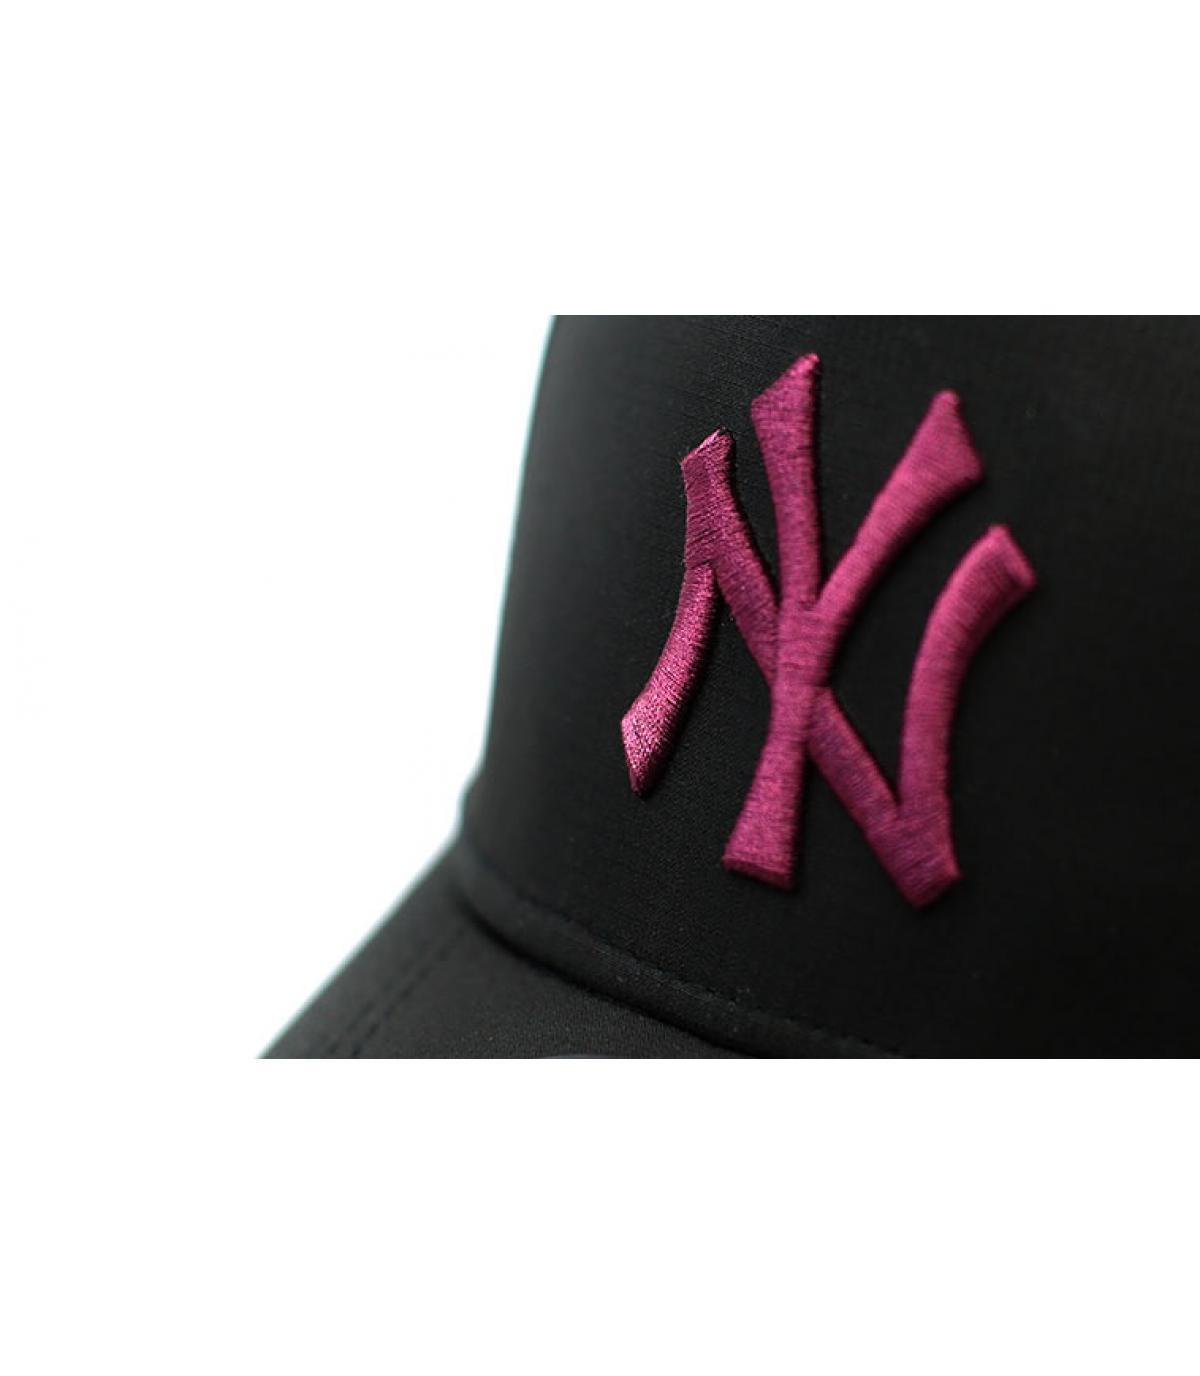 Dettagli Ripstop NY Aframe black maroon - image 3